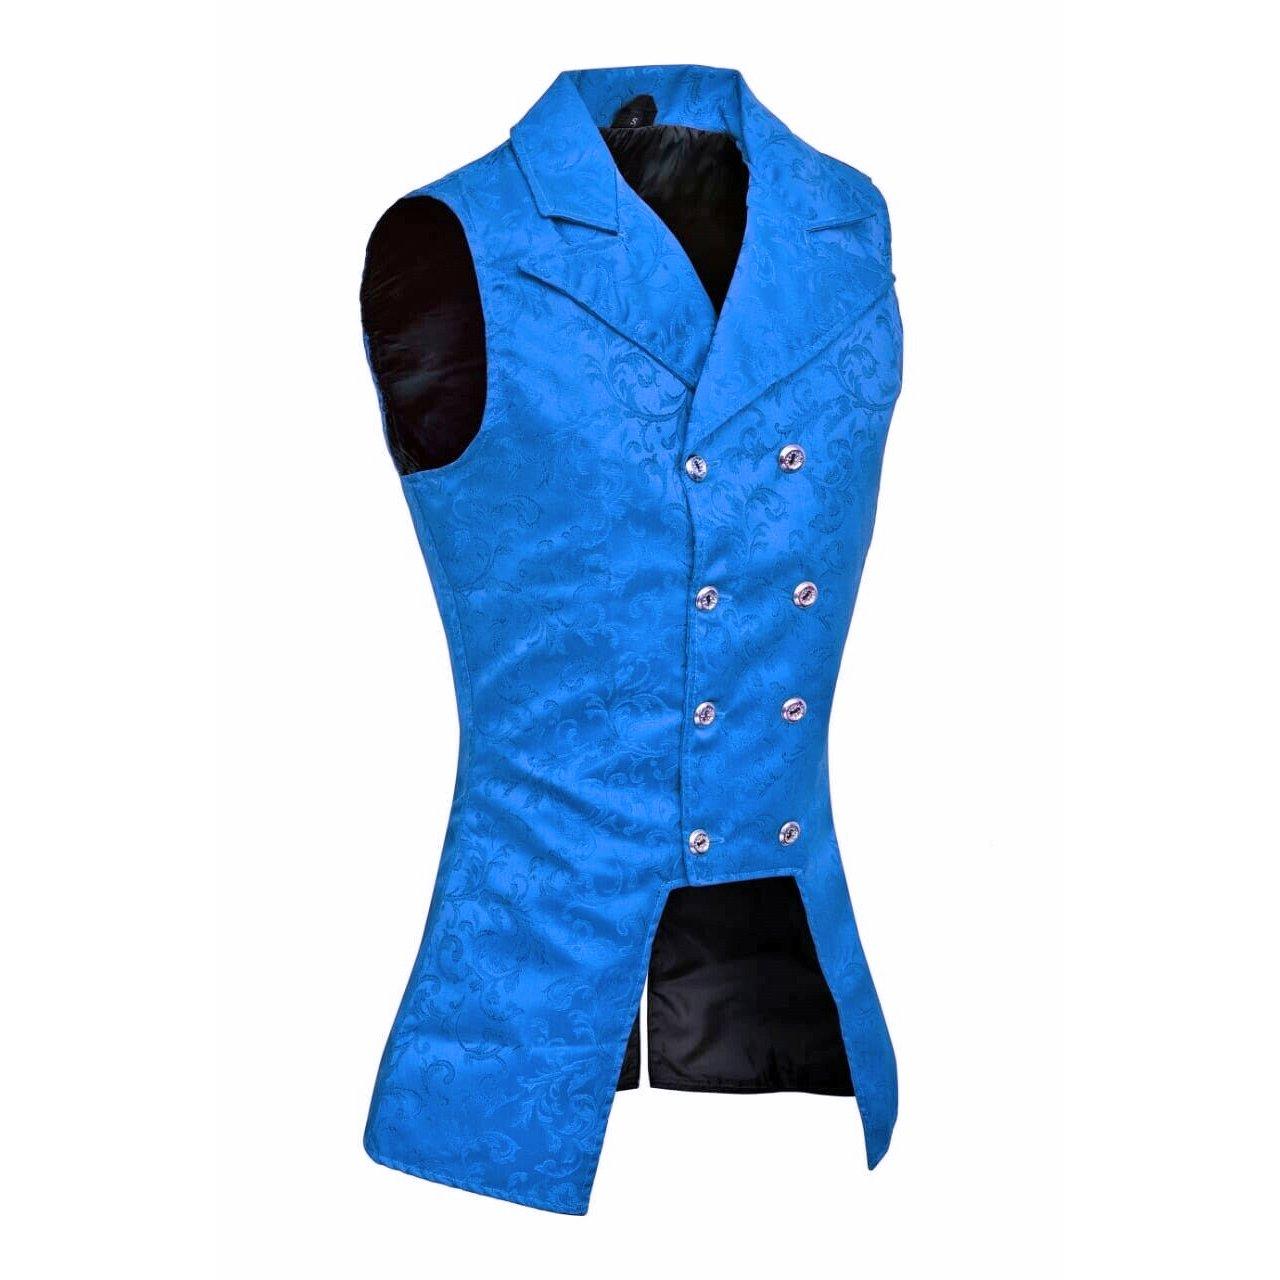 DARKROCK Royal Blue Double Breasted GOVERNOR Vest Waistcoat (side)